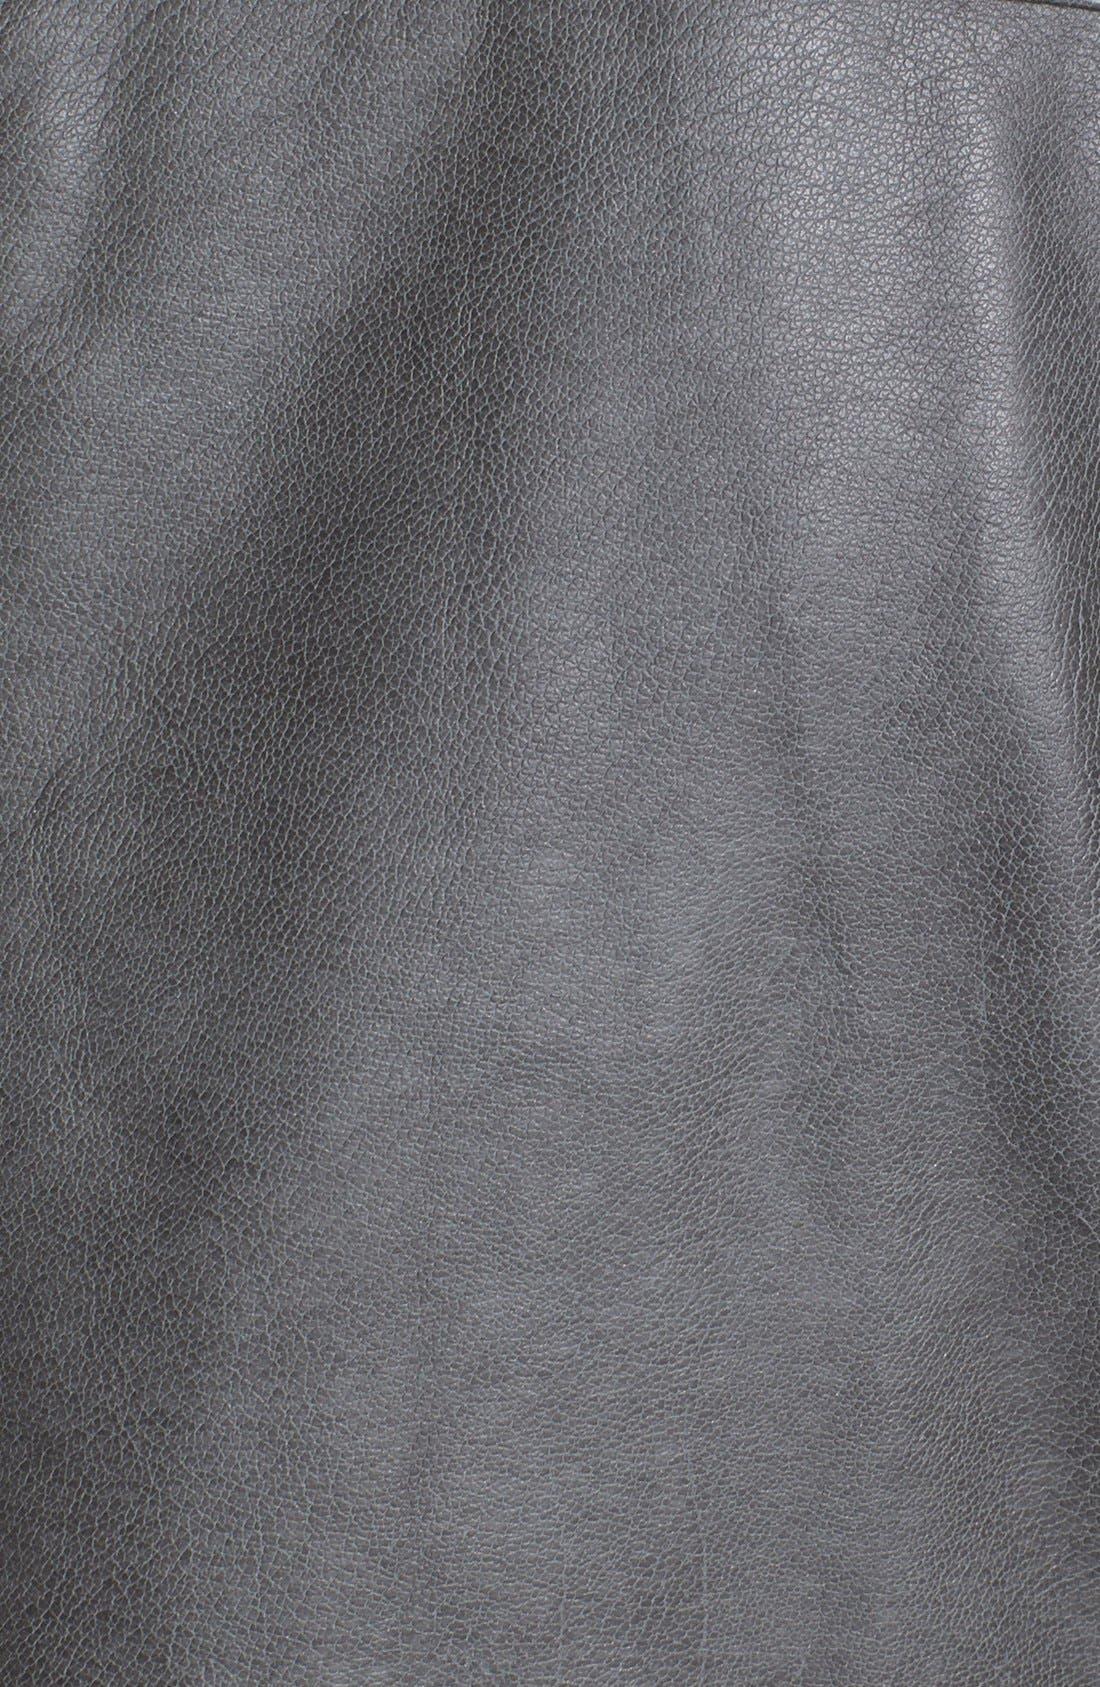 Alternate Image 4  - Jessica Simpson 'Trey' Faux Leather Moto Jacket